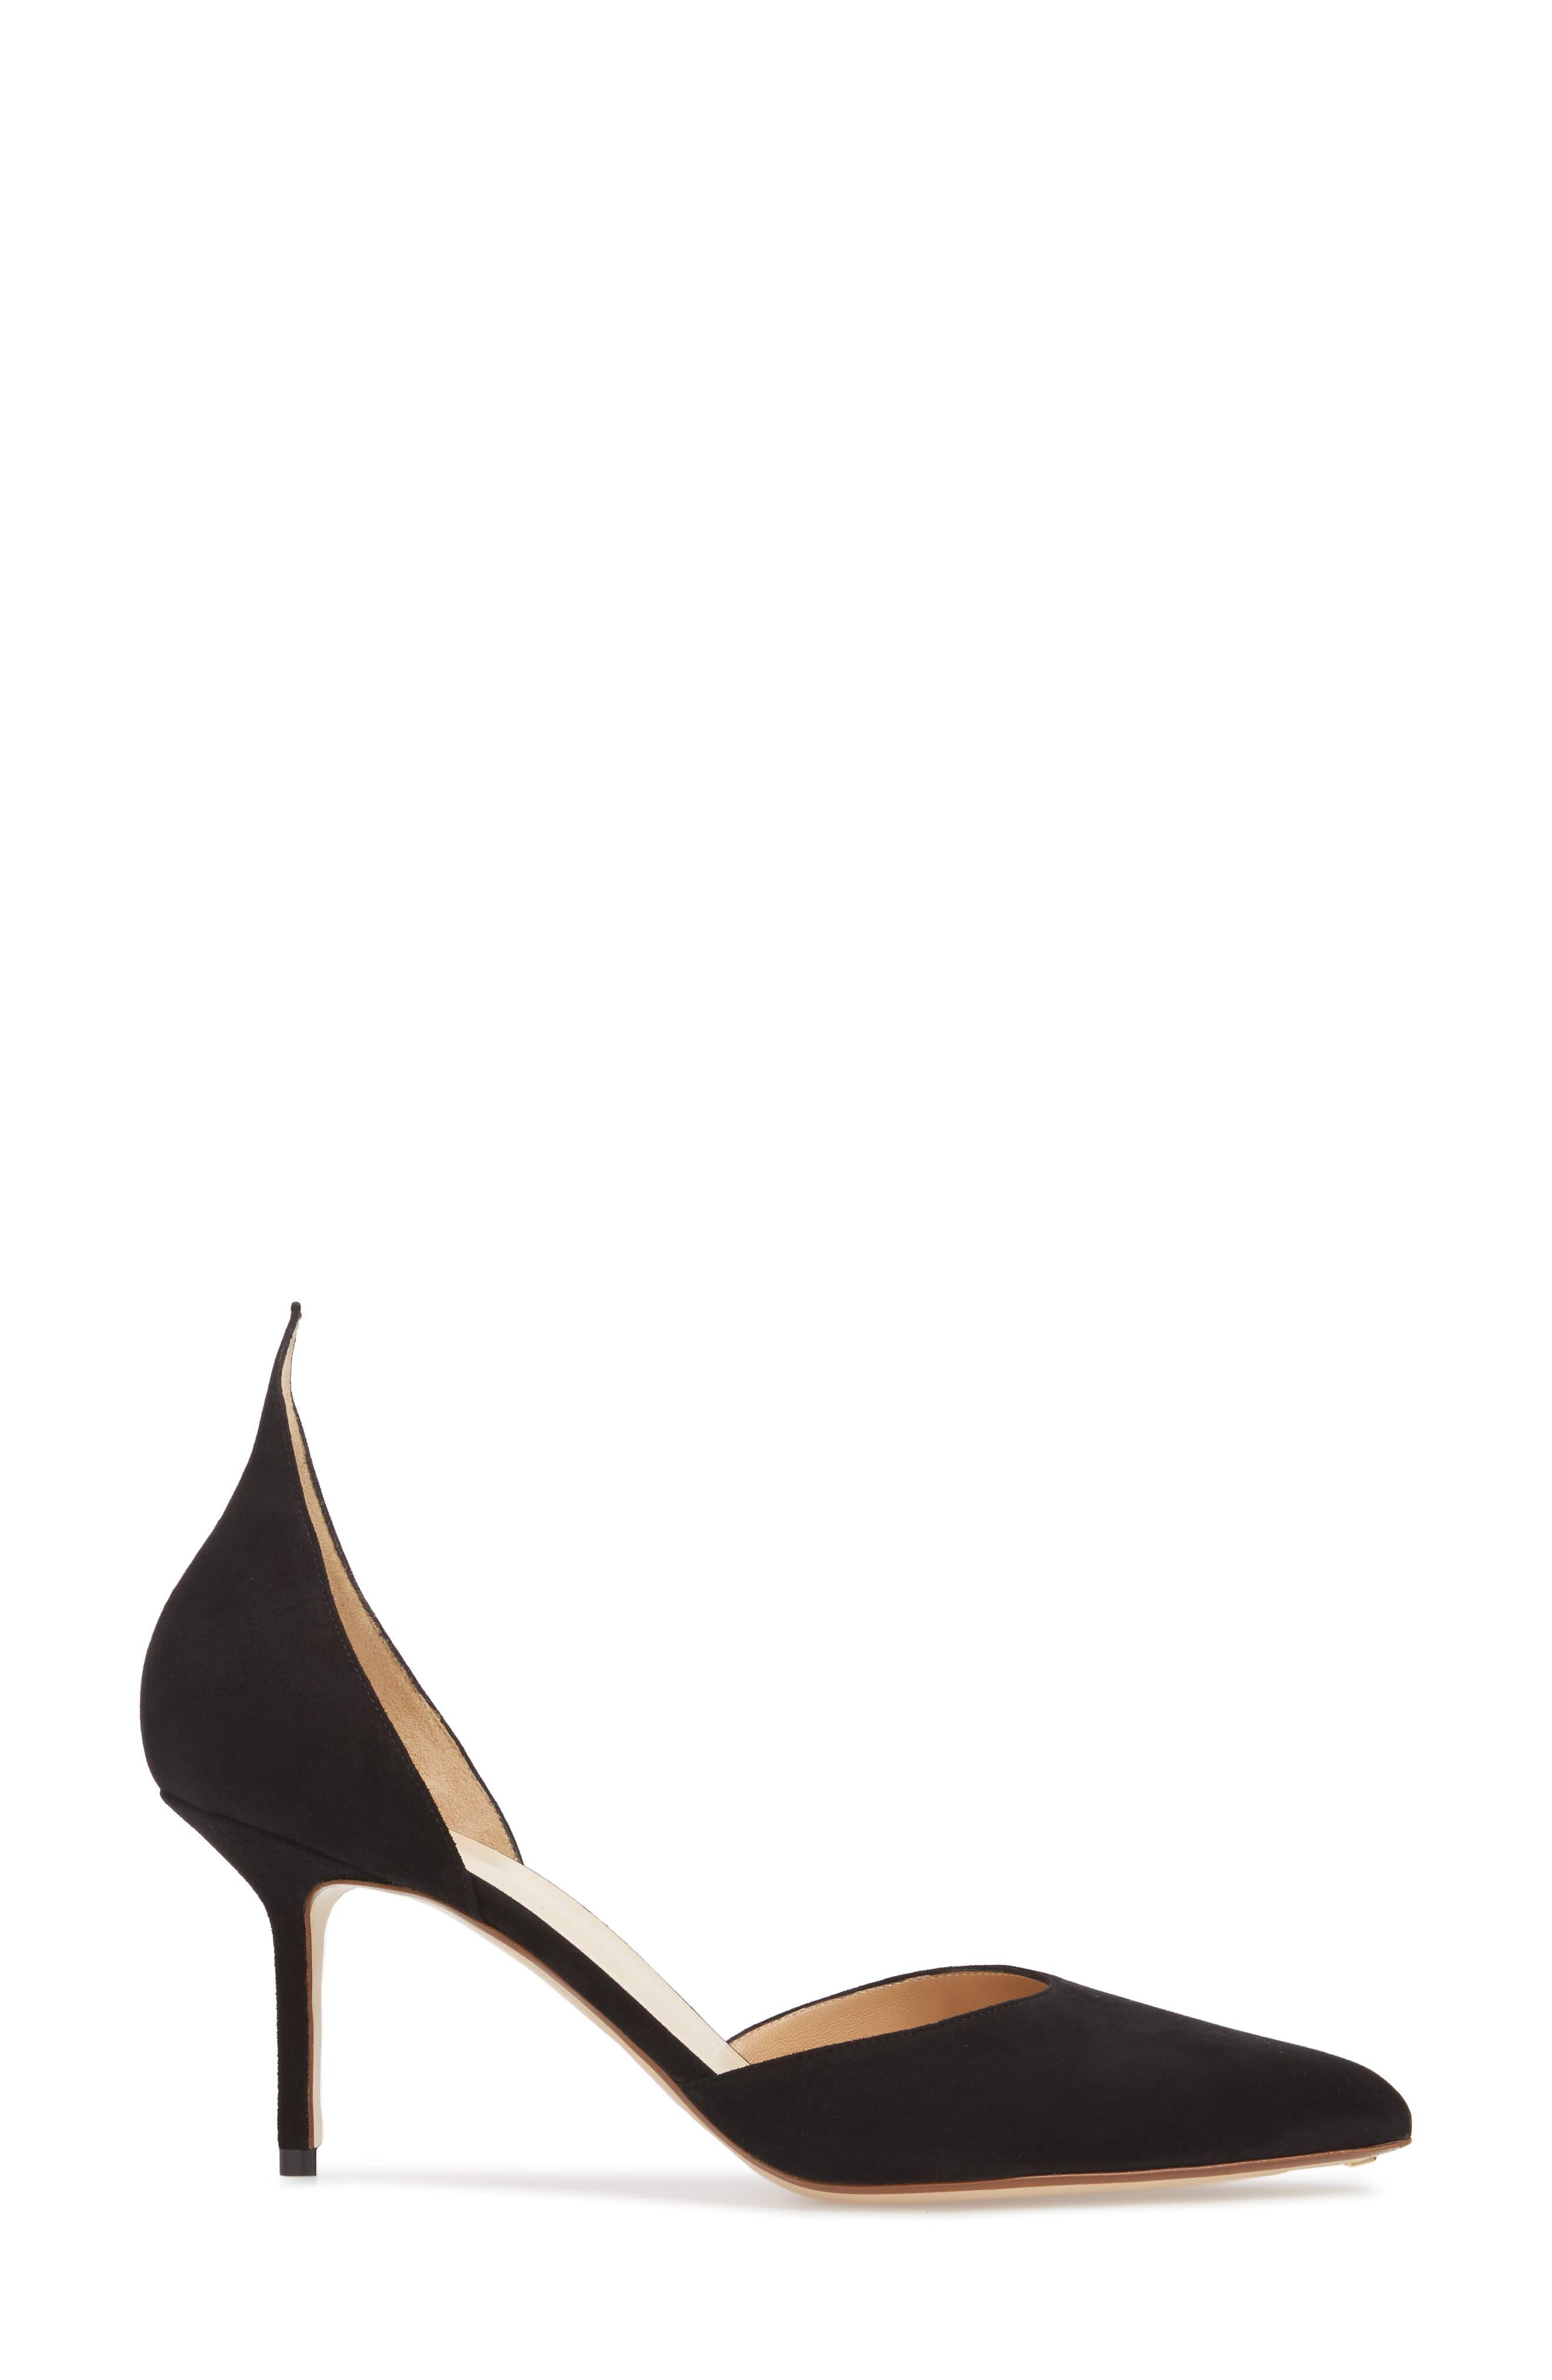 D'Orsay Pump,                             Alternate thumbnail 3, color,                             BLACK